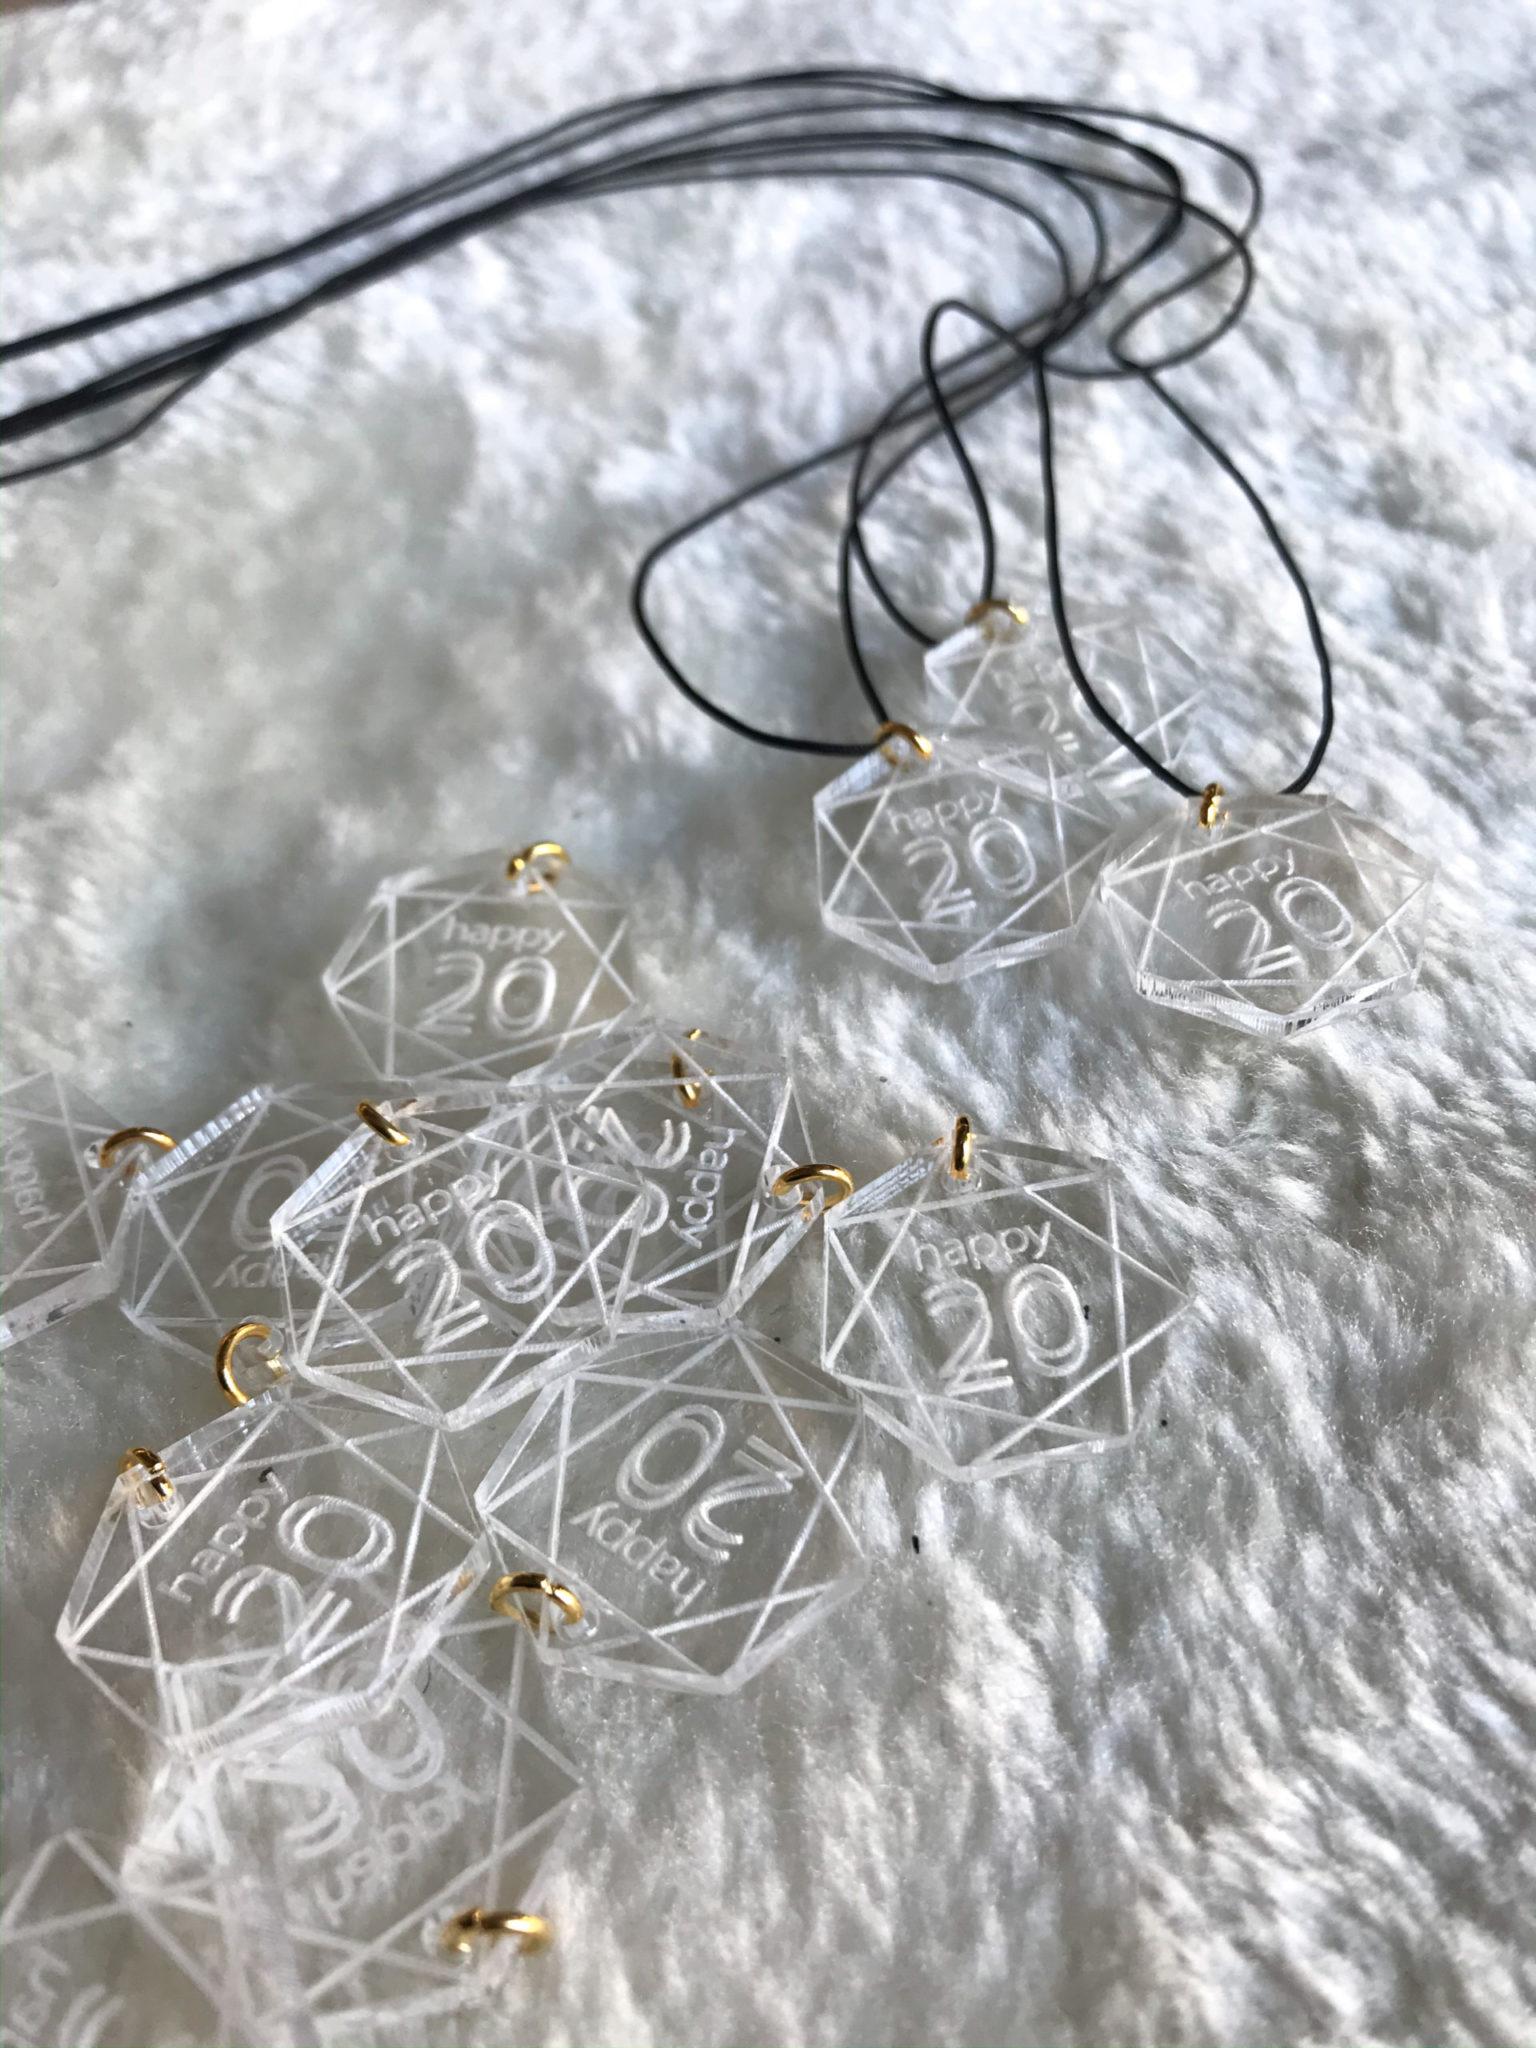 2020 Shine Bright Like A Diamond-special occasion-necklace